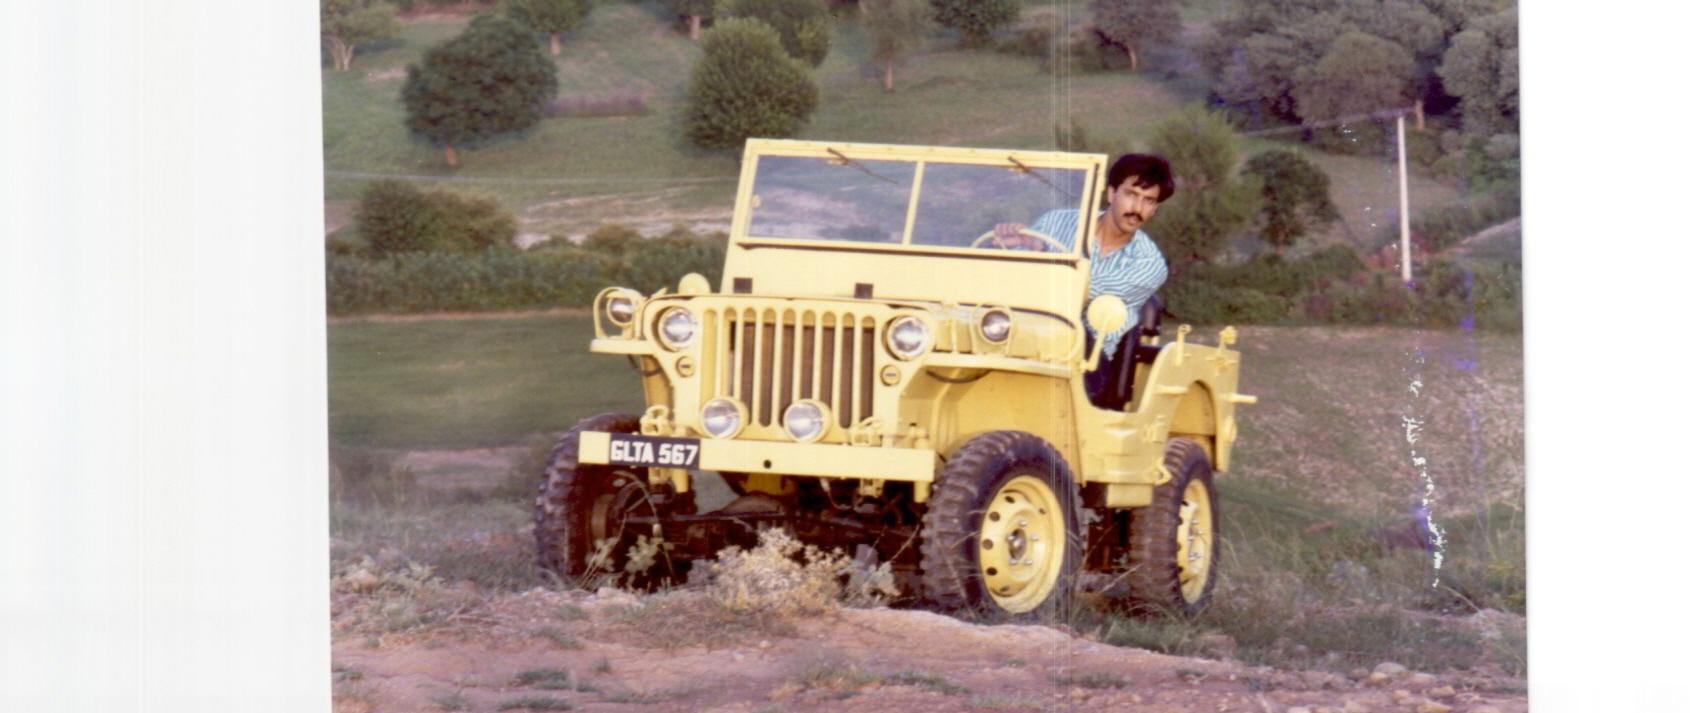 The 2LT Diesel Dyno Panga - filephp?id3936